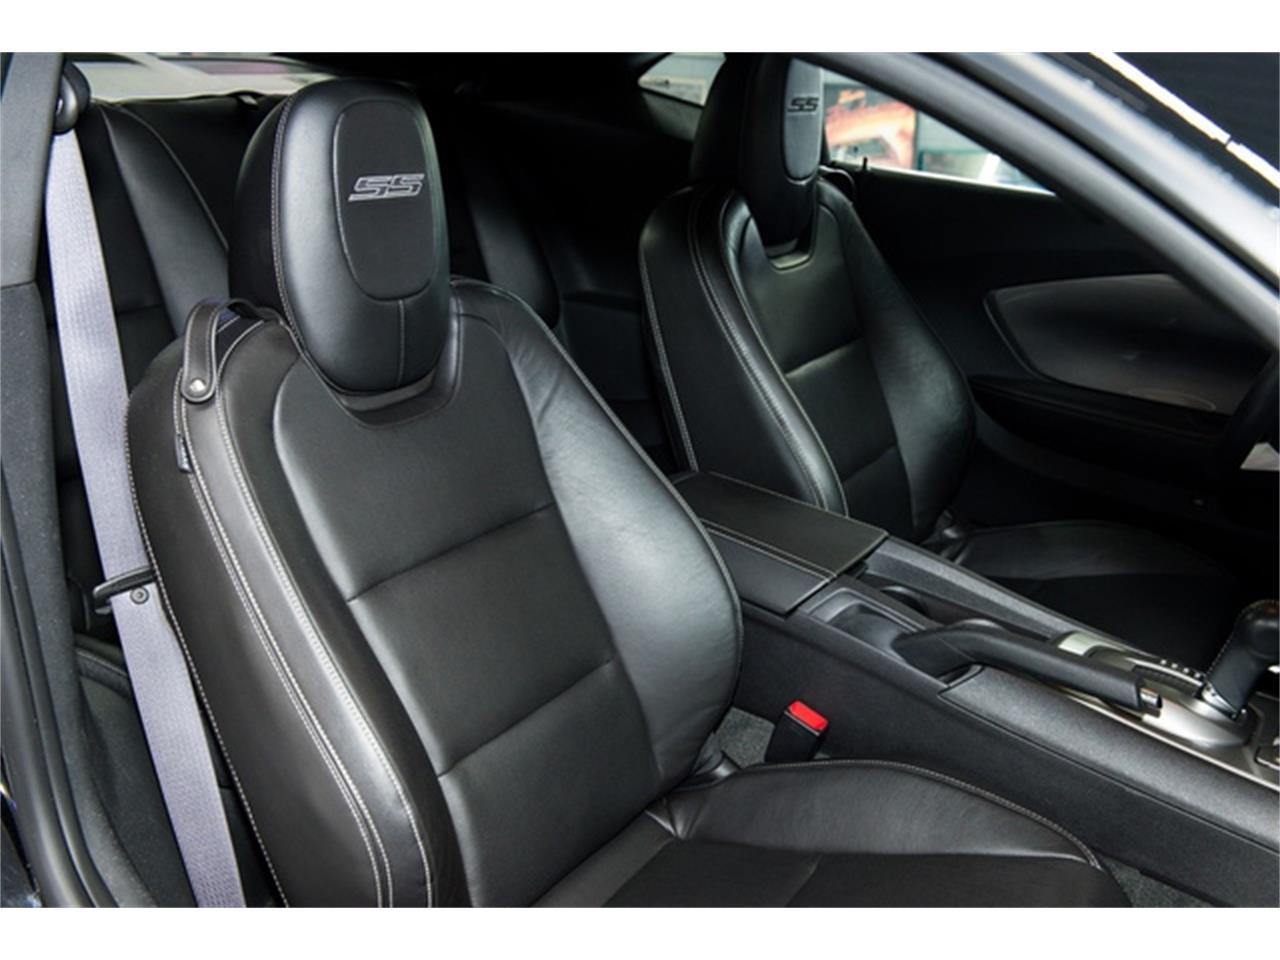 2010 Chevrolet Camaro (CC-1320561) for sale in Wayne, Michigan